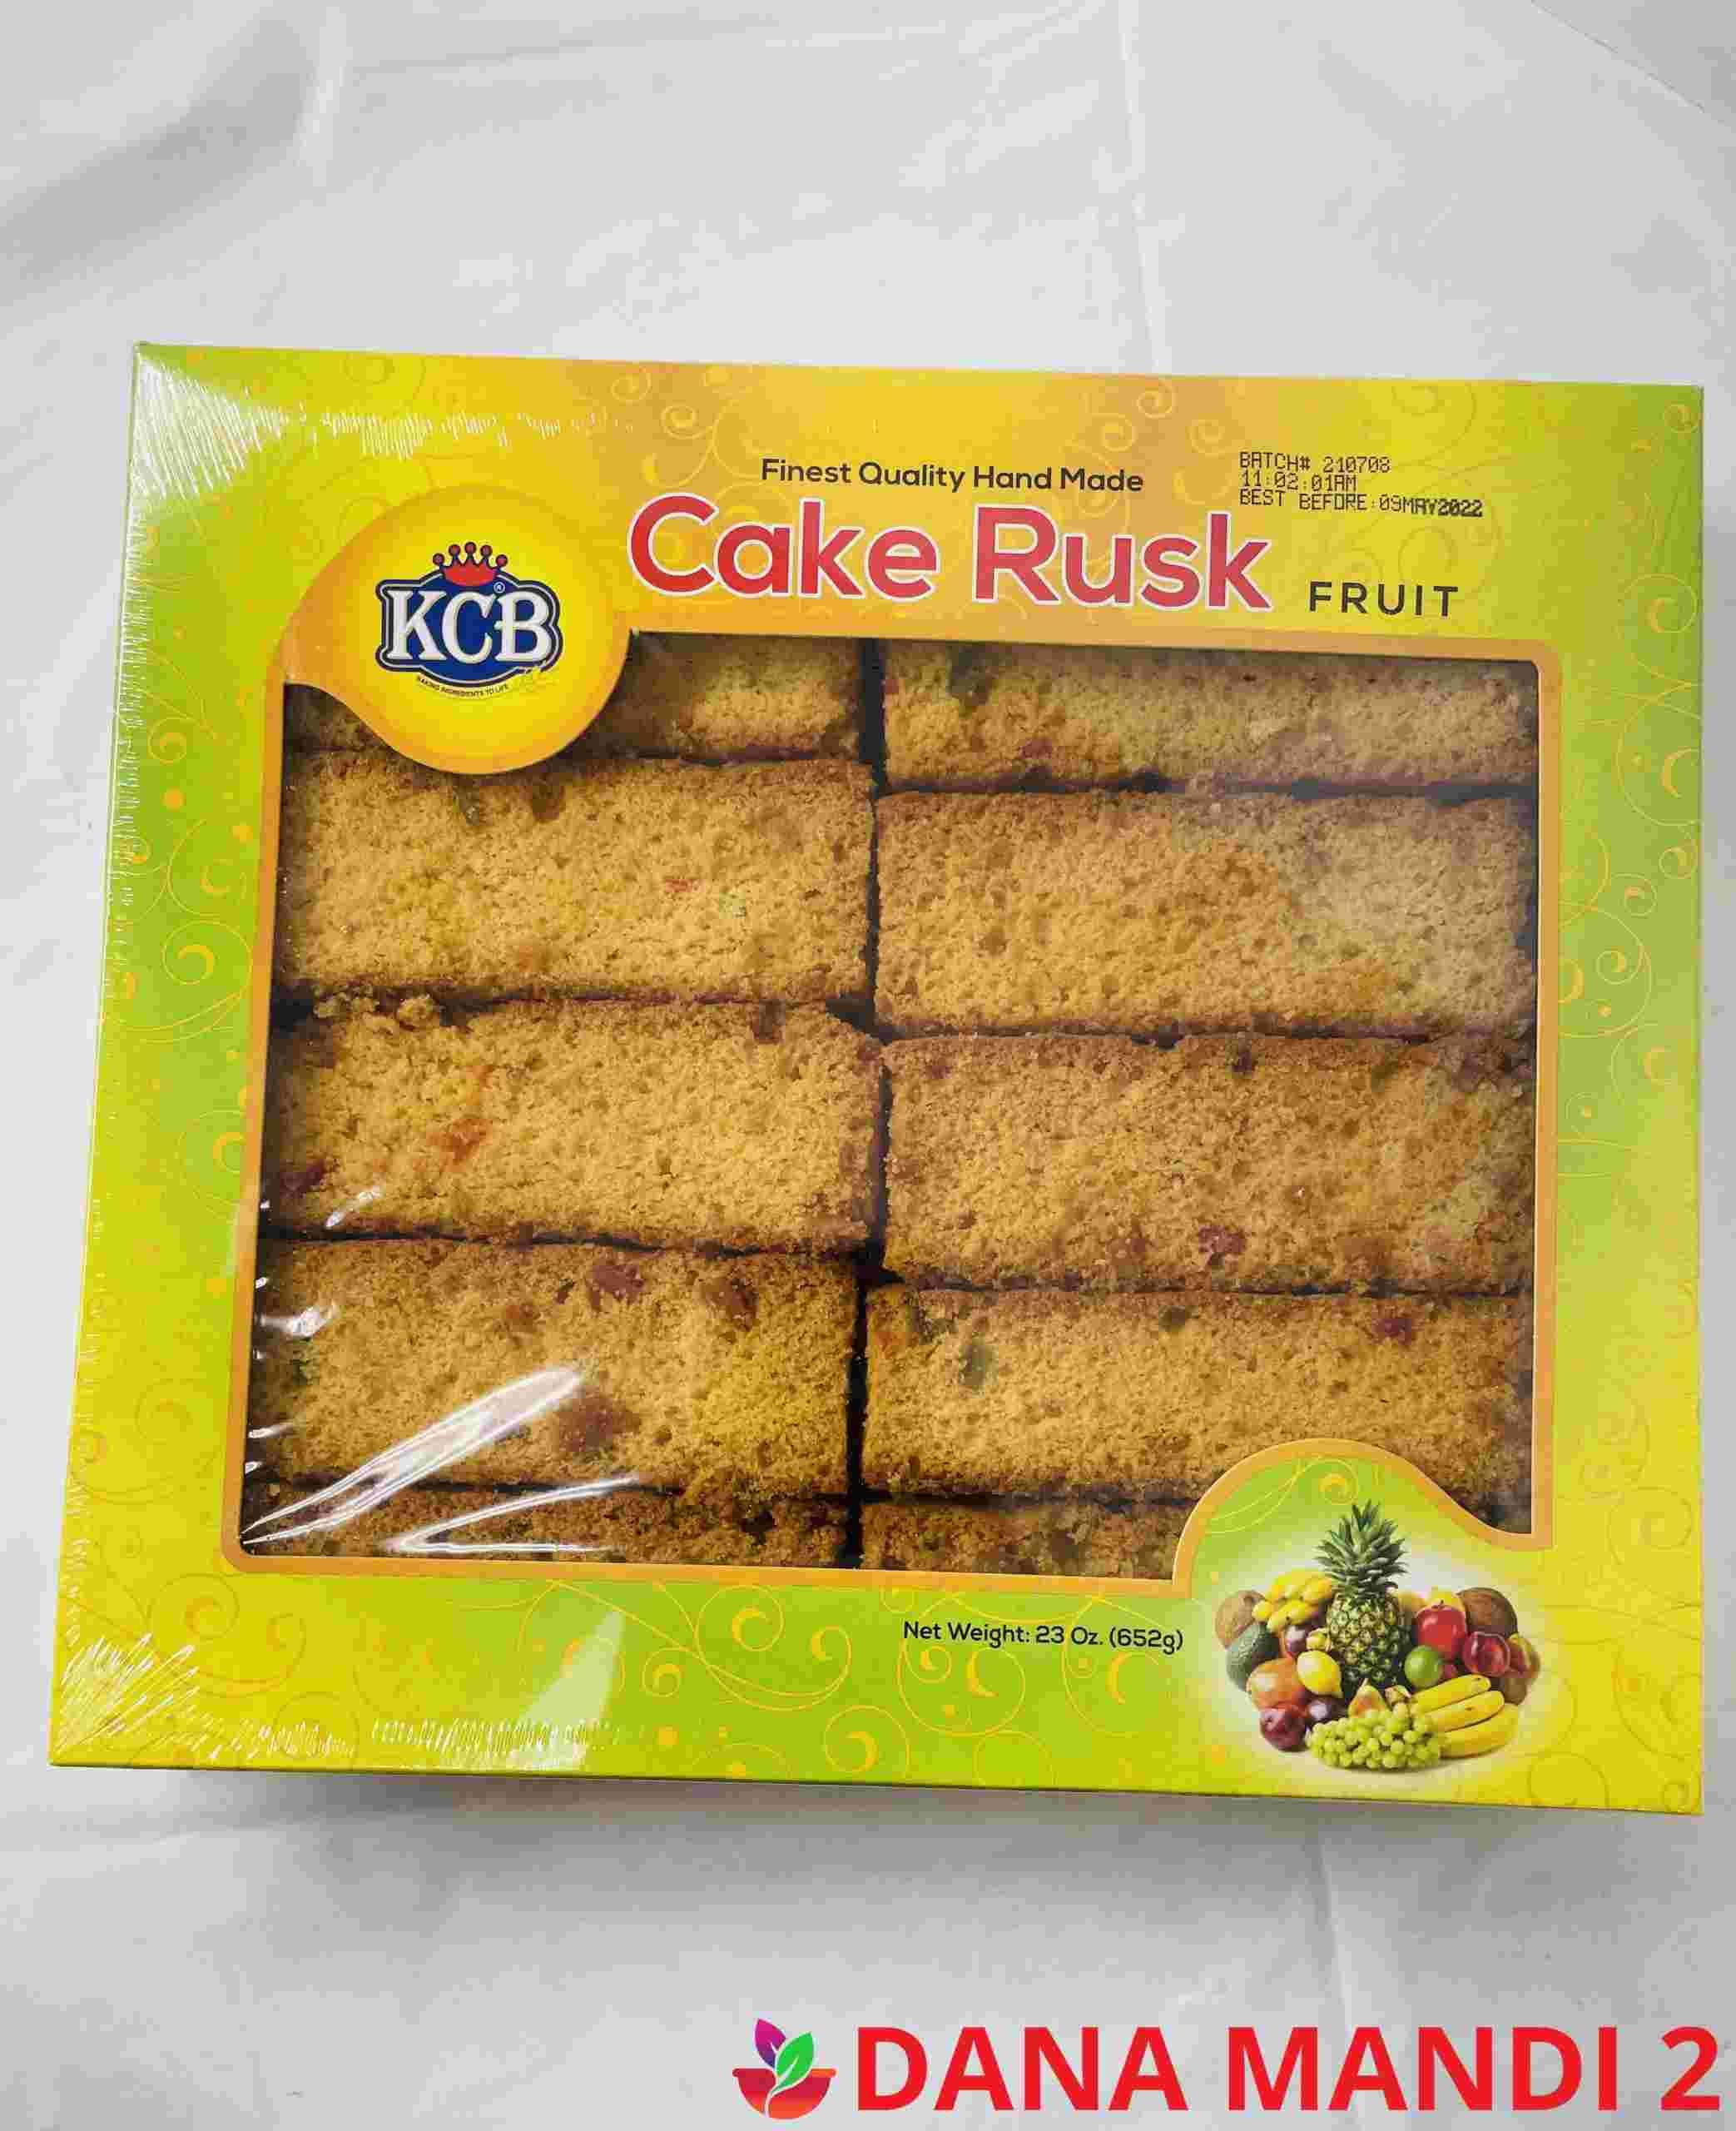 KCB Cake Rusk Fruit